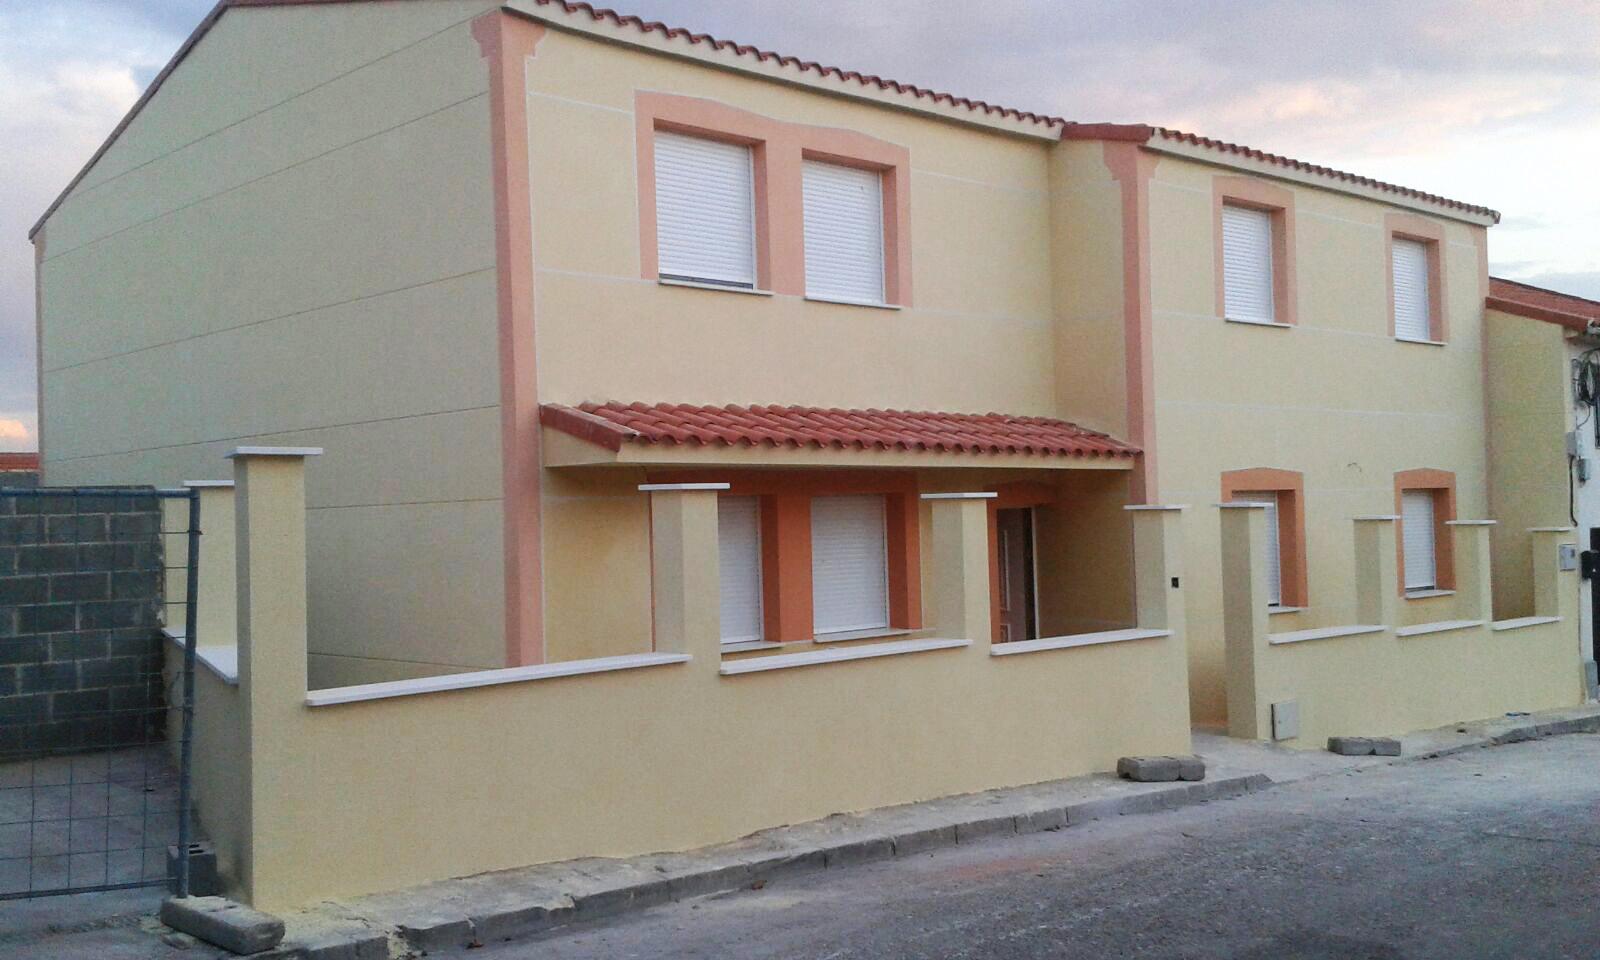 Fachada de vivienda unifamiliar lm reformas albacete for Frentes de viviendas